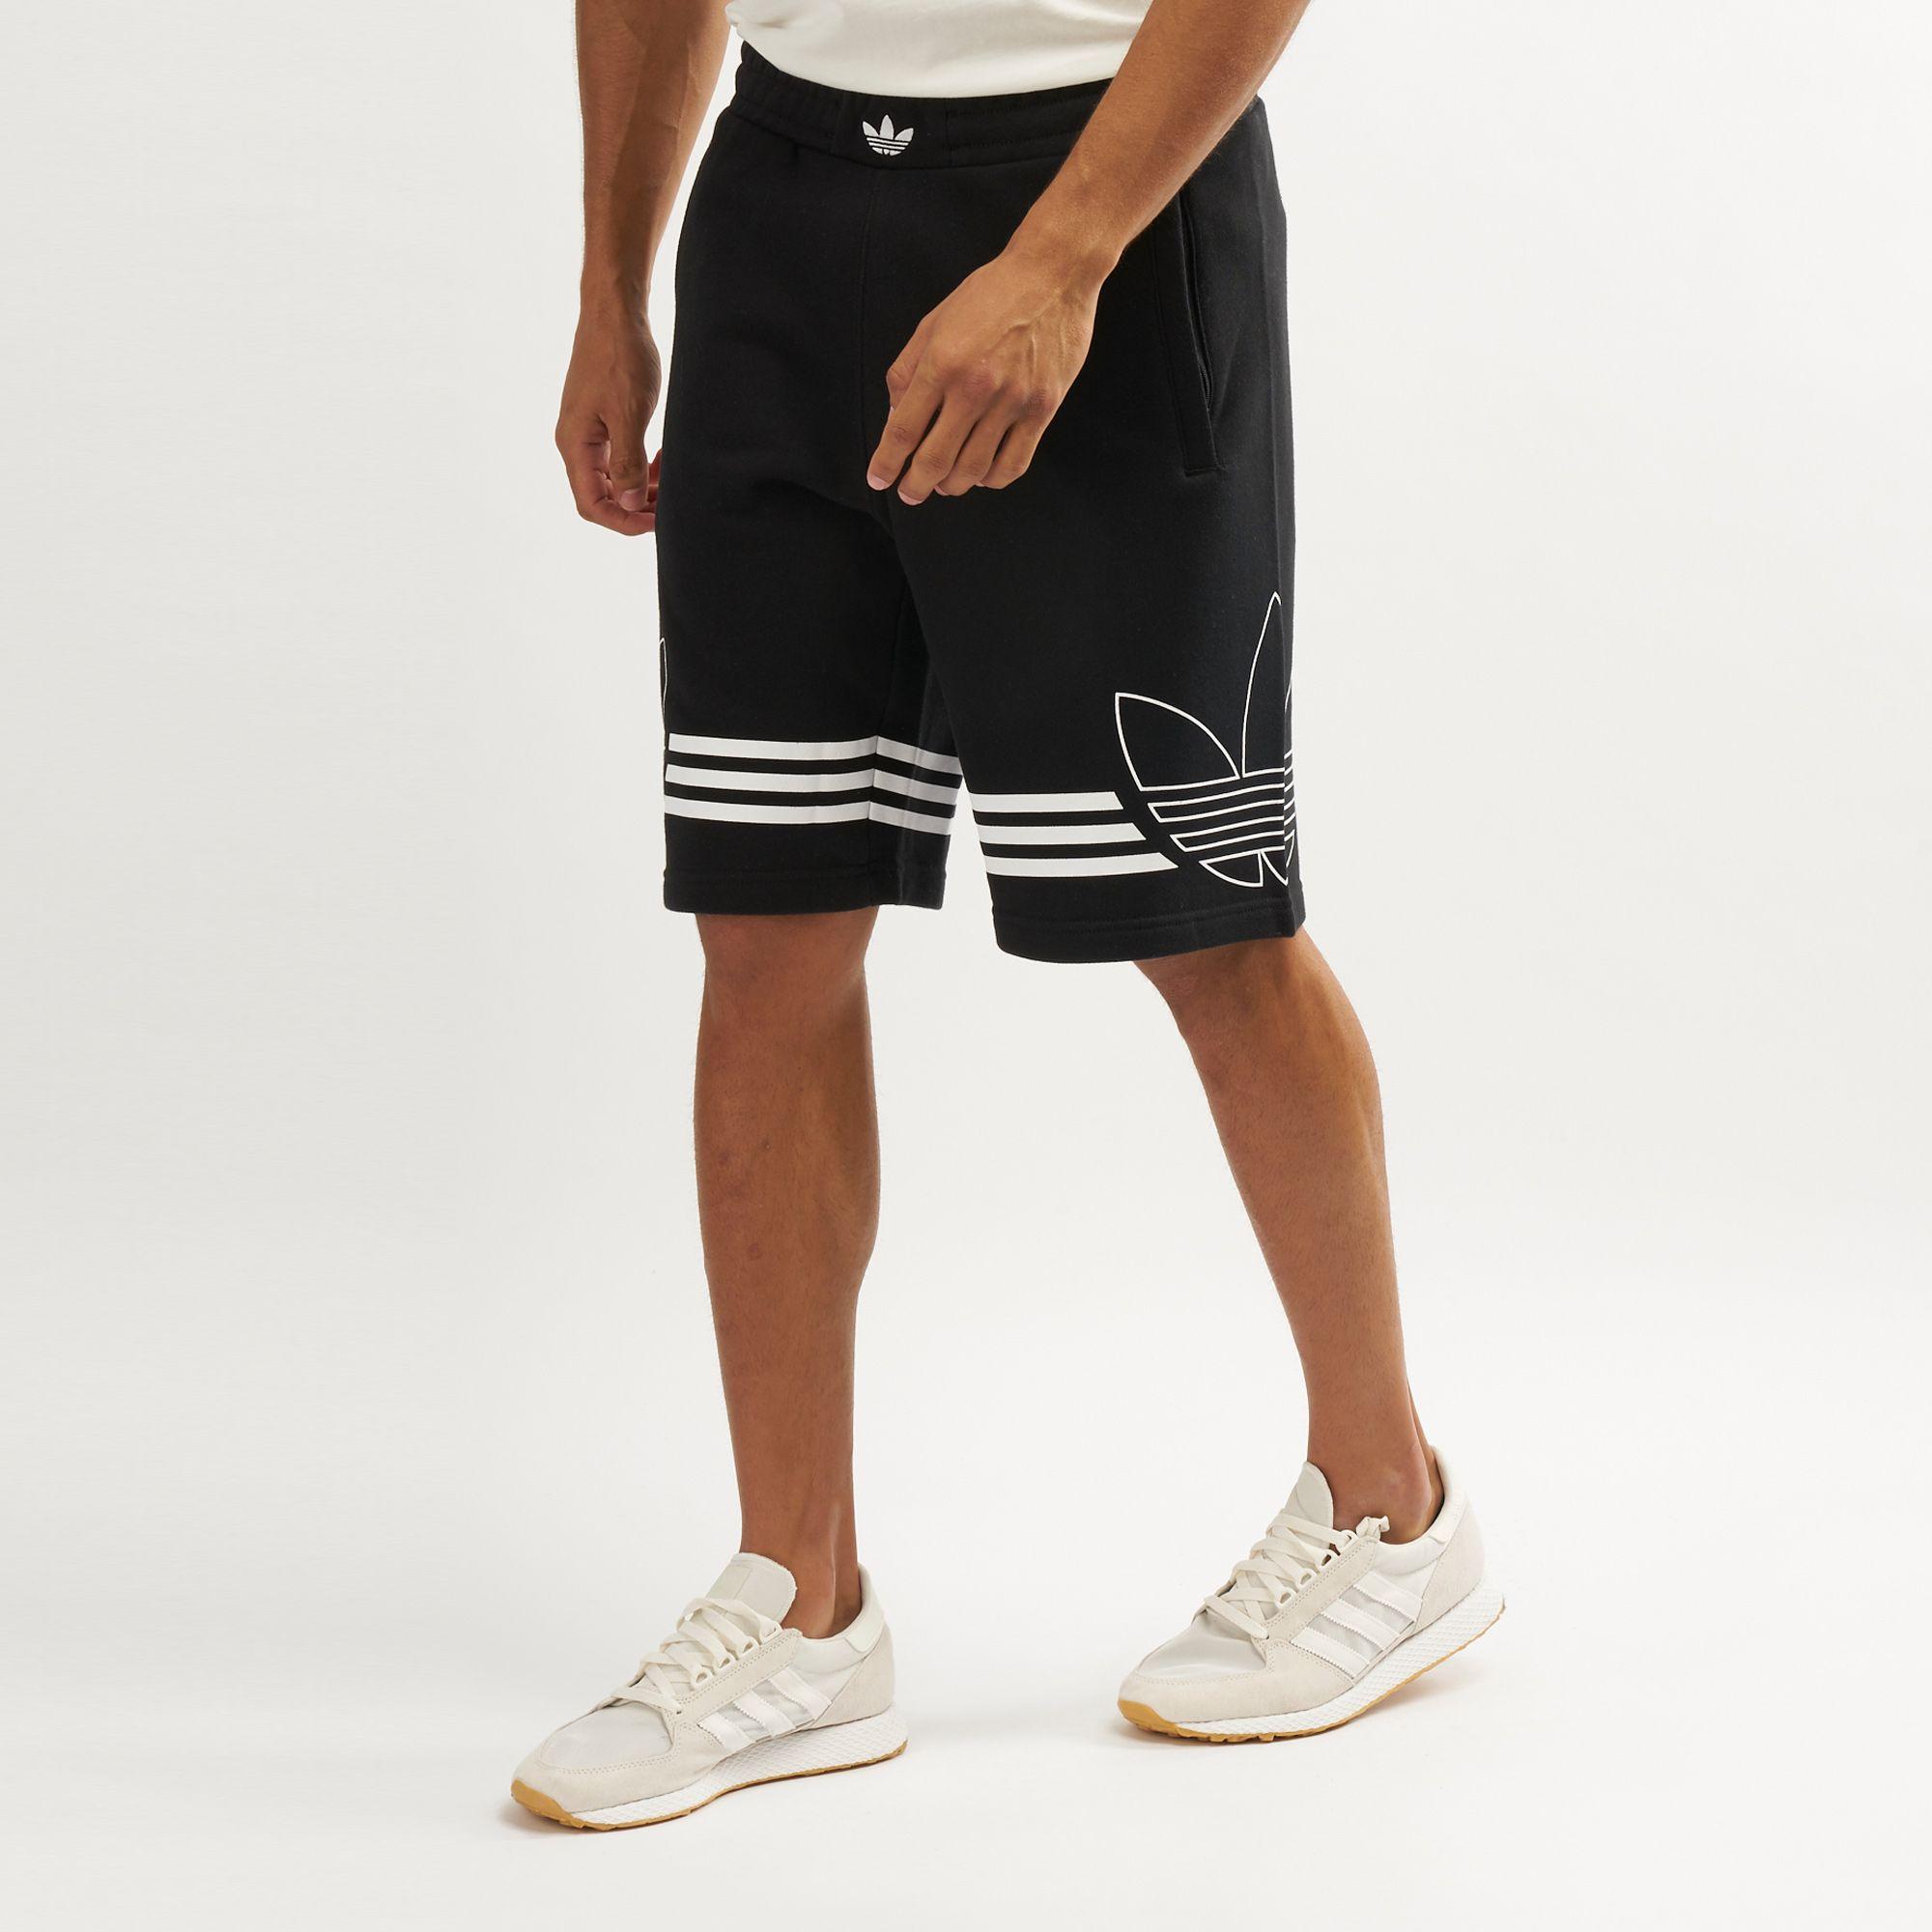 adidas Originals Men's Trefoil Logo Outline Short | Shorts